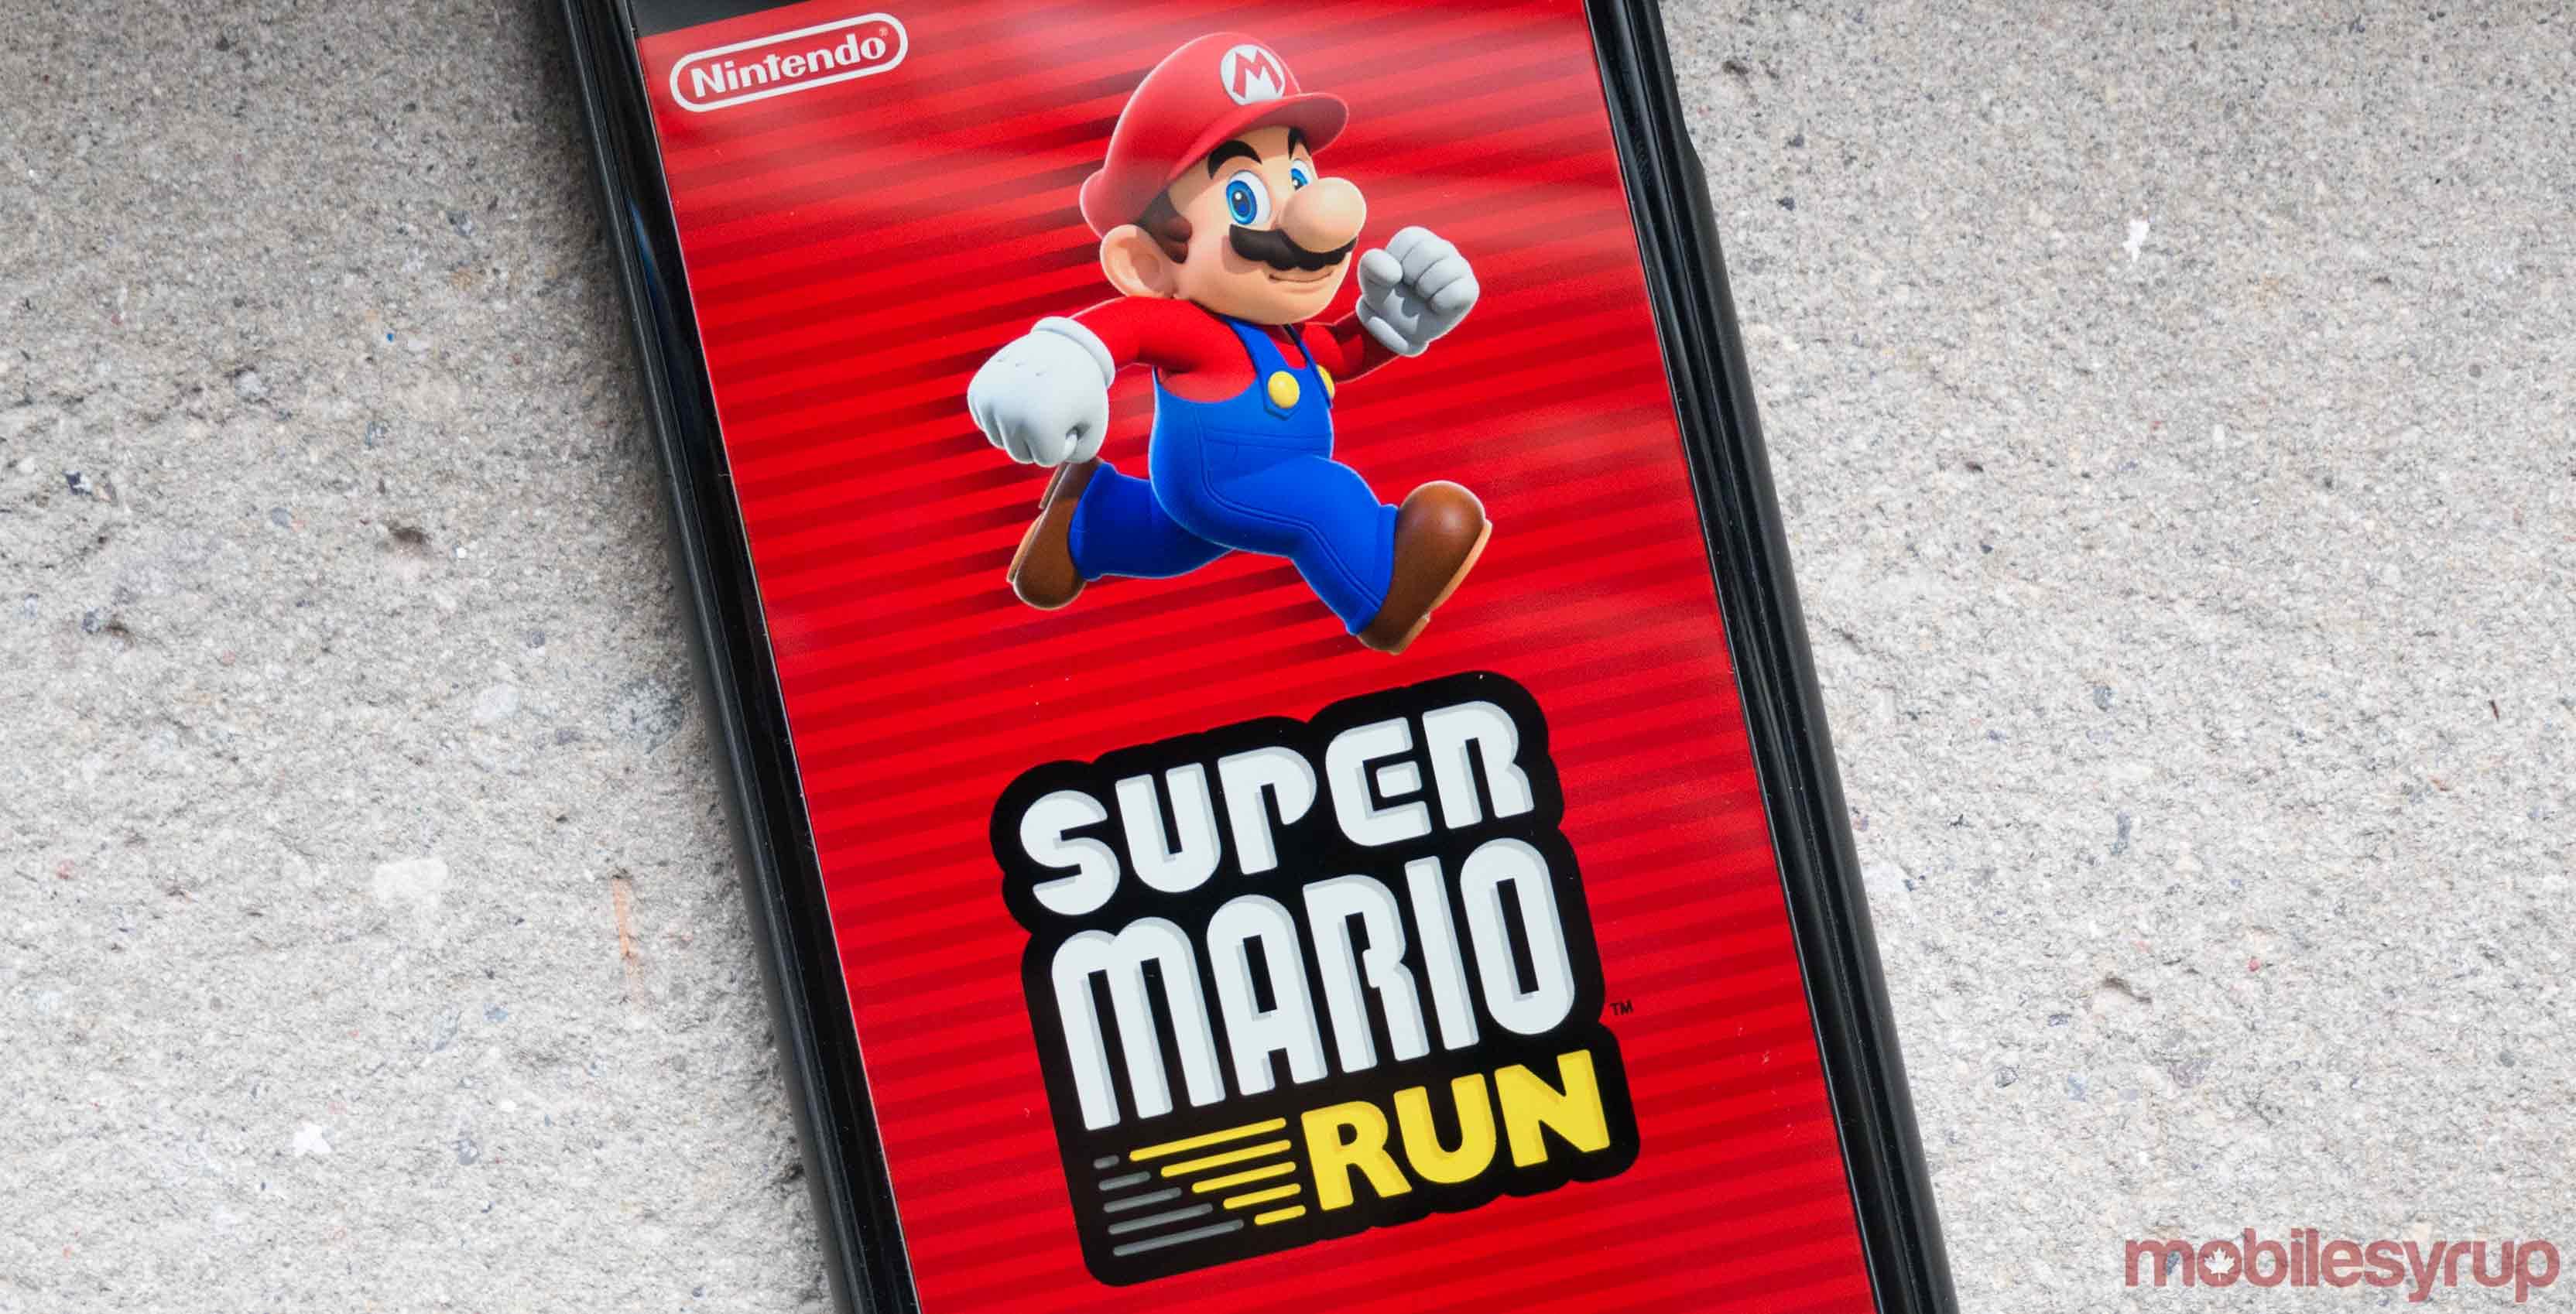 Super Mario Run on iPhone